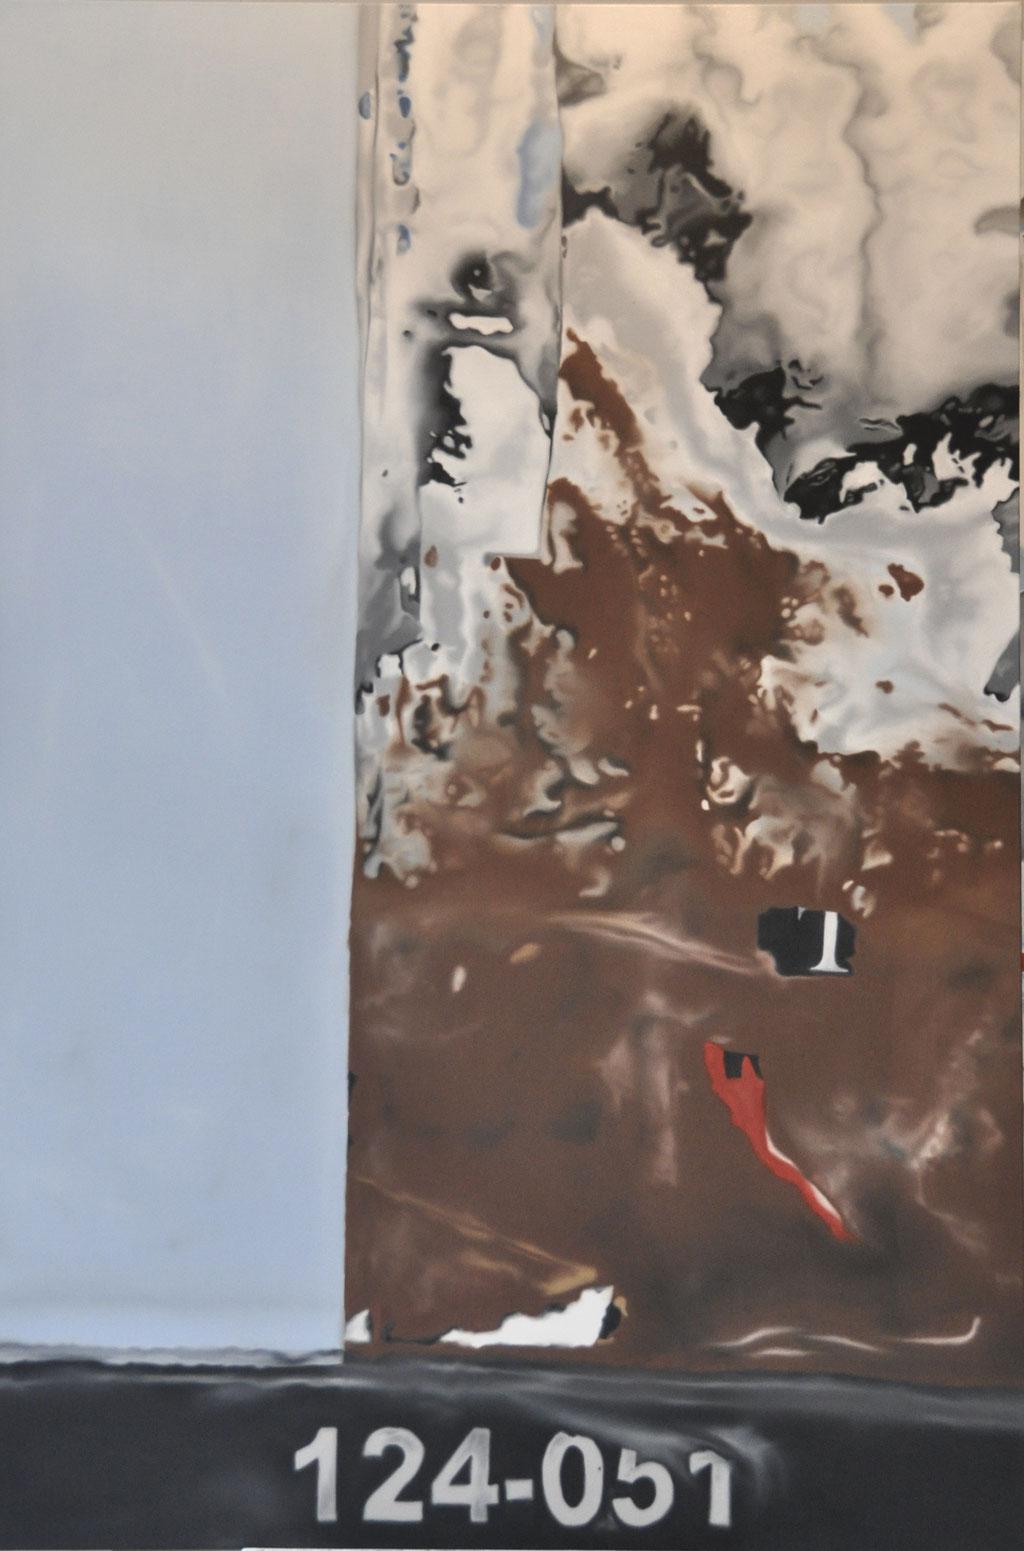 124-051, oil on canvas, 120 x 180 cm, 2018